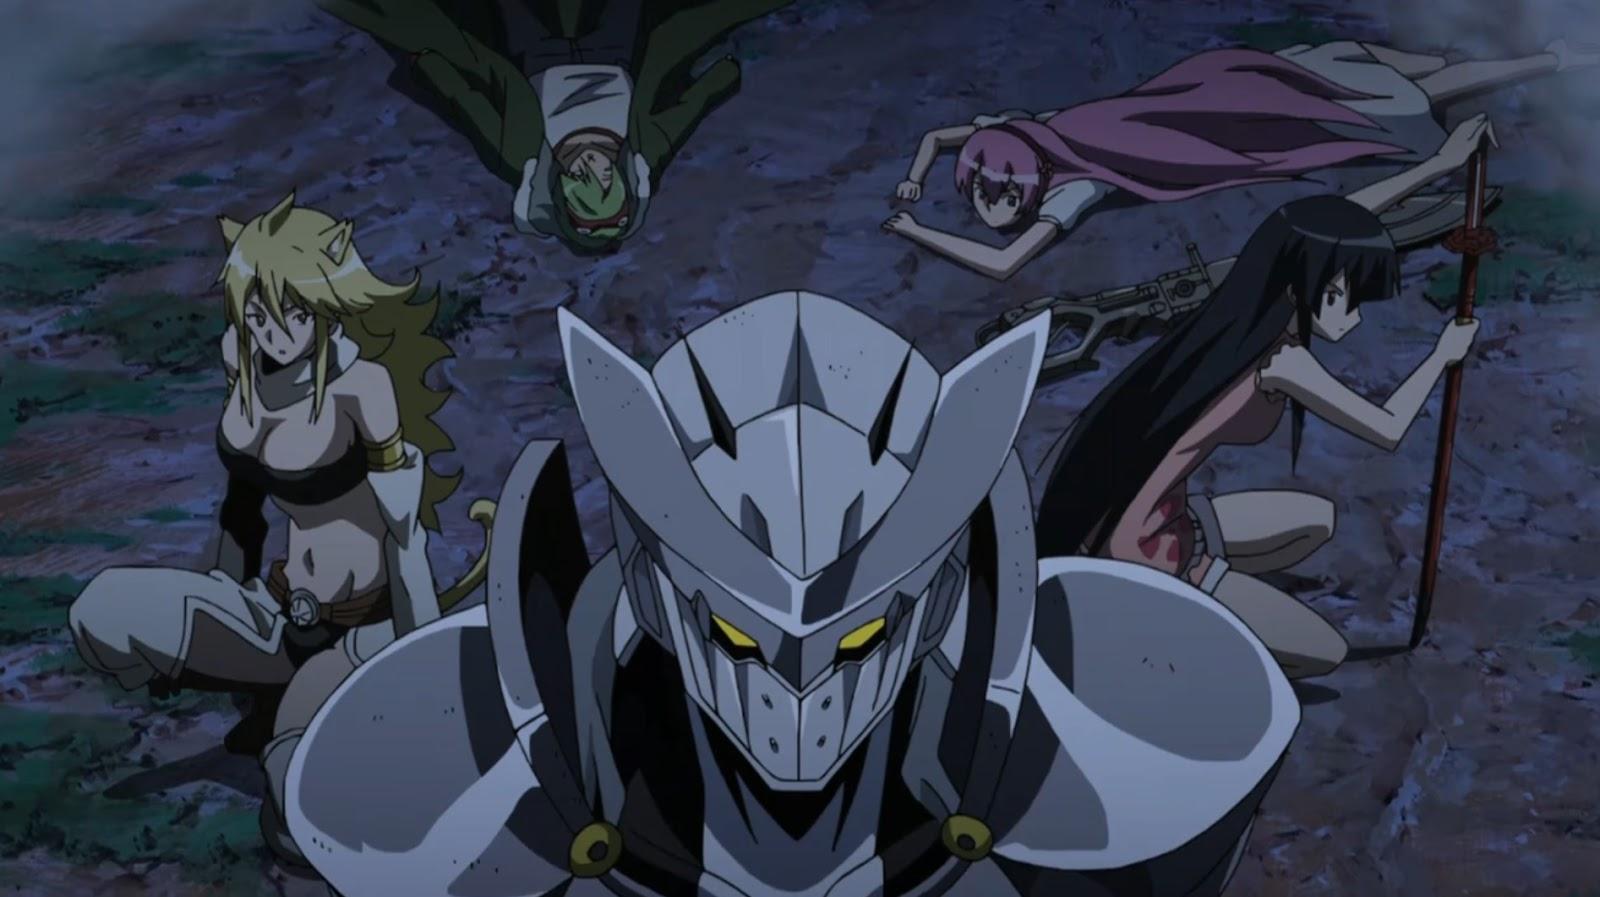 Assistir Akame ga Kill Episódio 11 HD, Akame ga Kill Episódio 11, Akame ga Kill! Episódio 11, Legendado Online, Akame ga Kill Episódio 11 Todos os Episódios